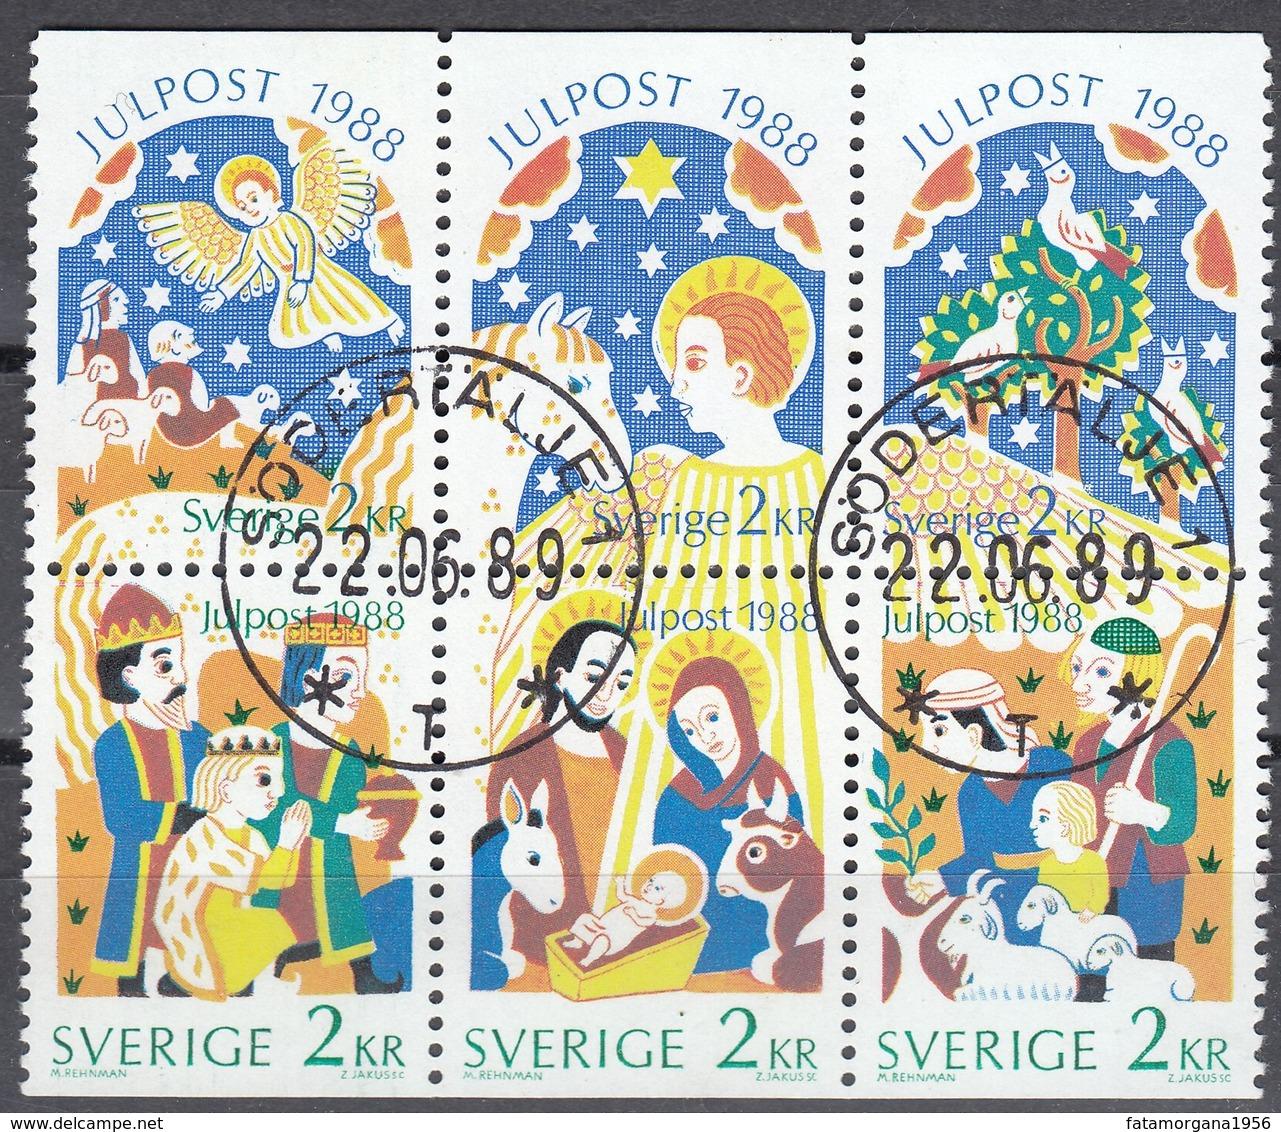 SVERIGE - SVEZIA - SWEDEN - 1988 - Serie Completa Obliterata: Yvert 1496/1501; 6 Valori Uniti. - Schweden